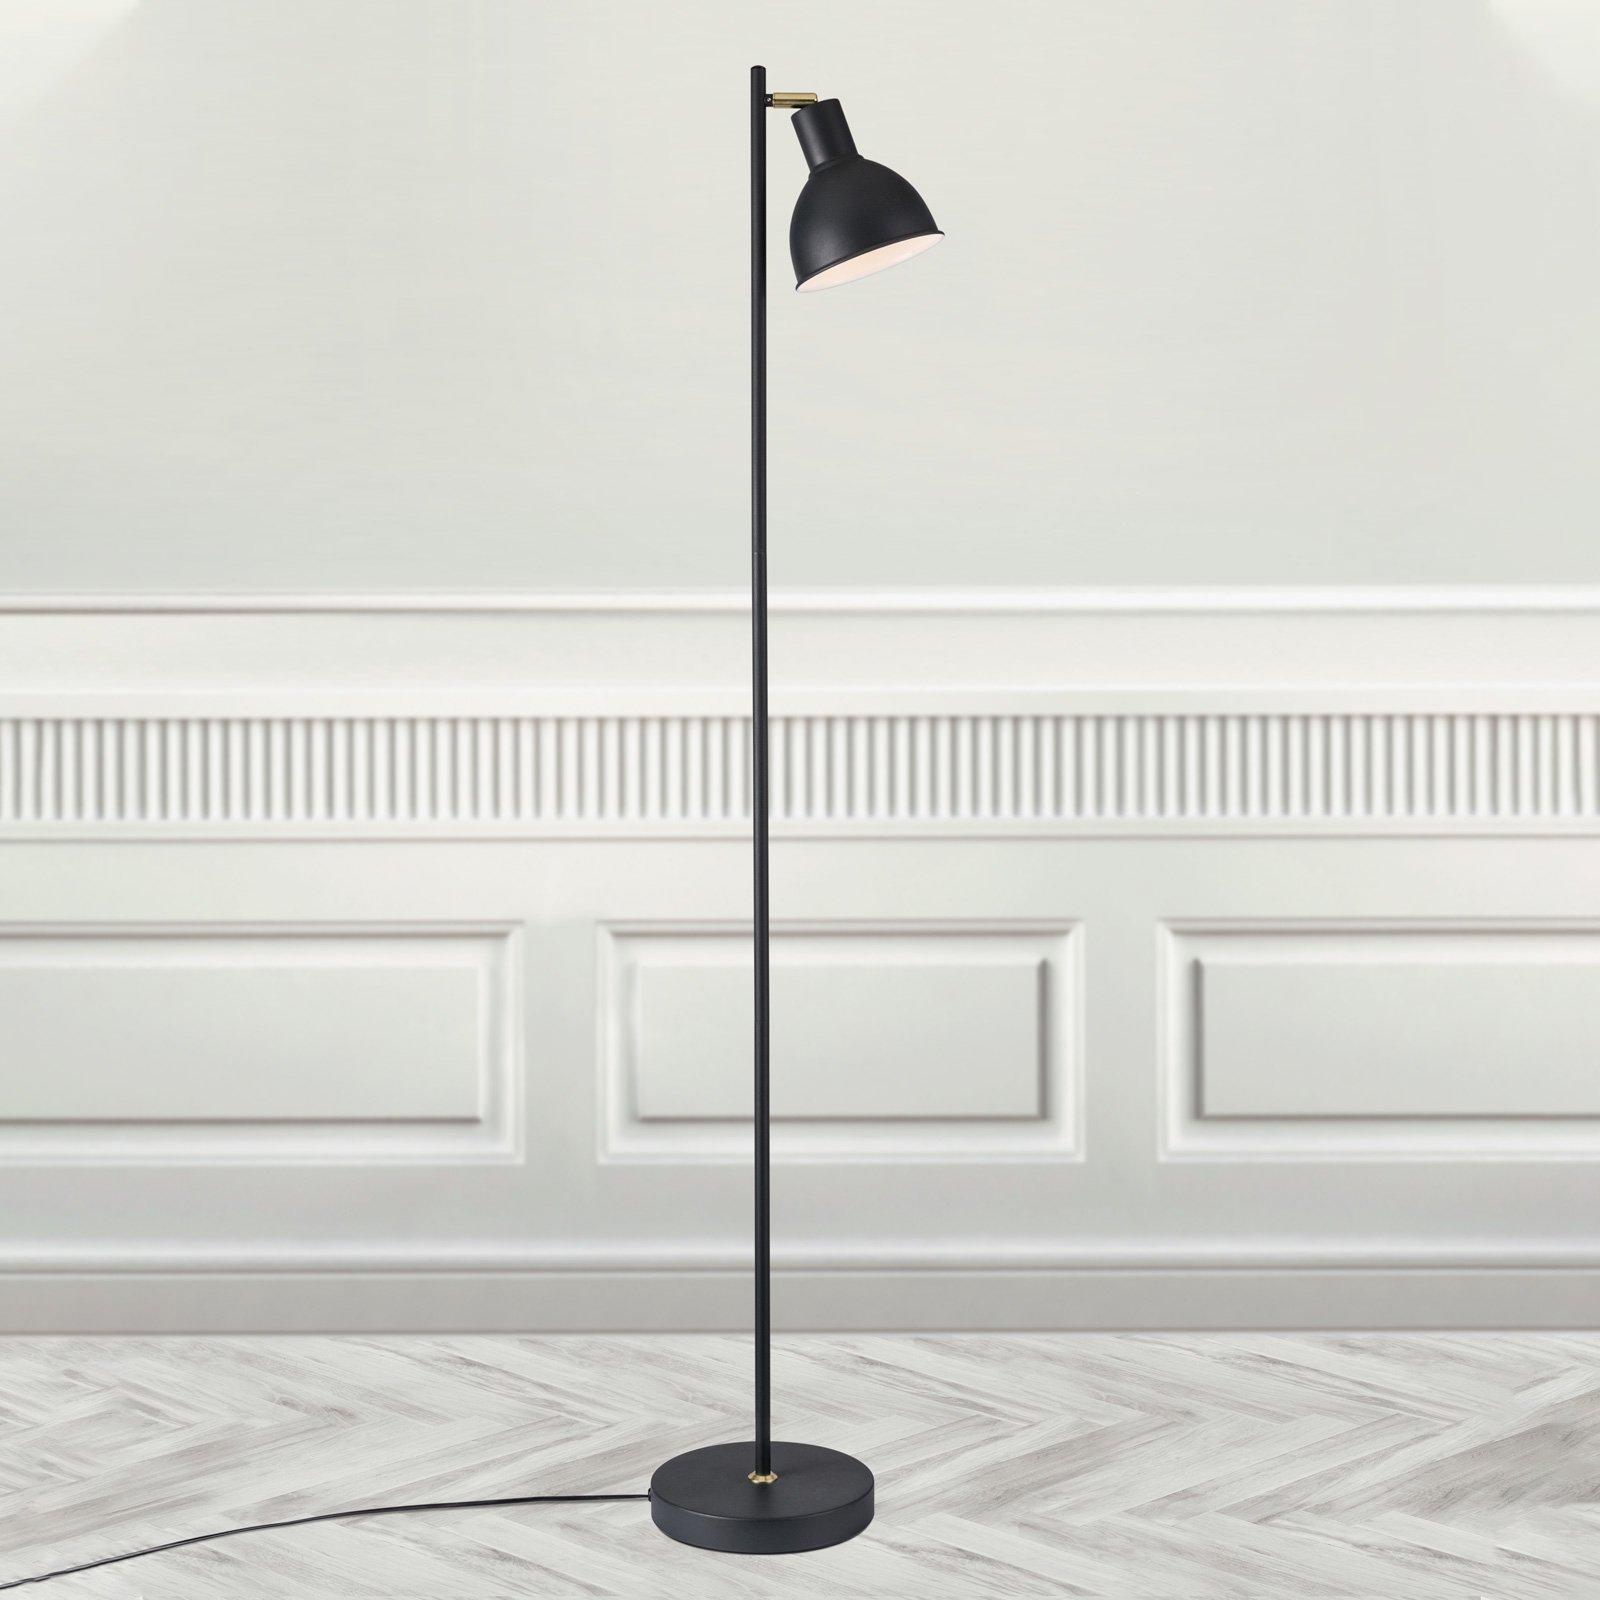 Gulvlampe Pop i slank design, svart